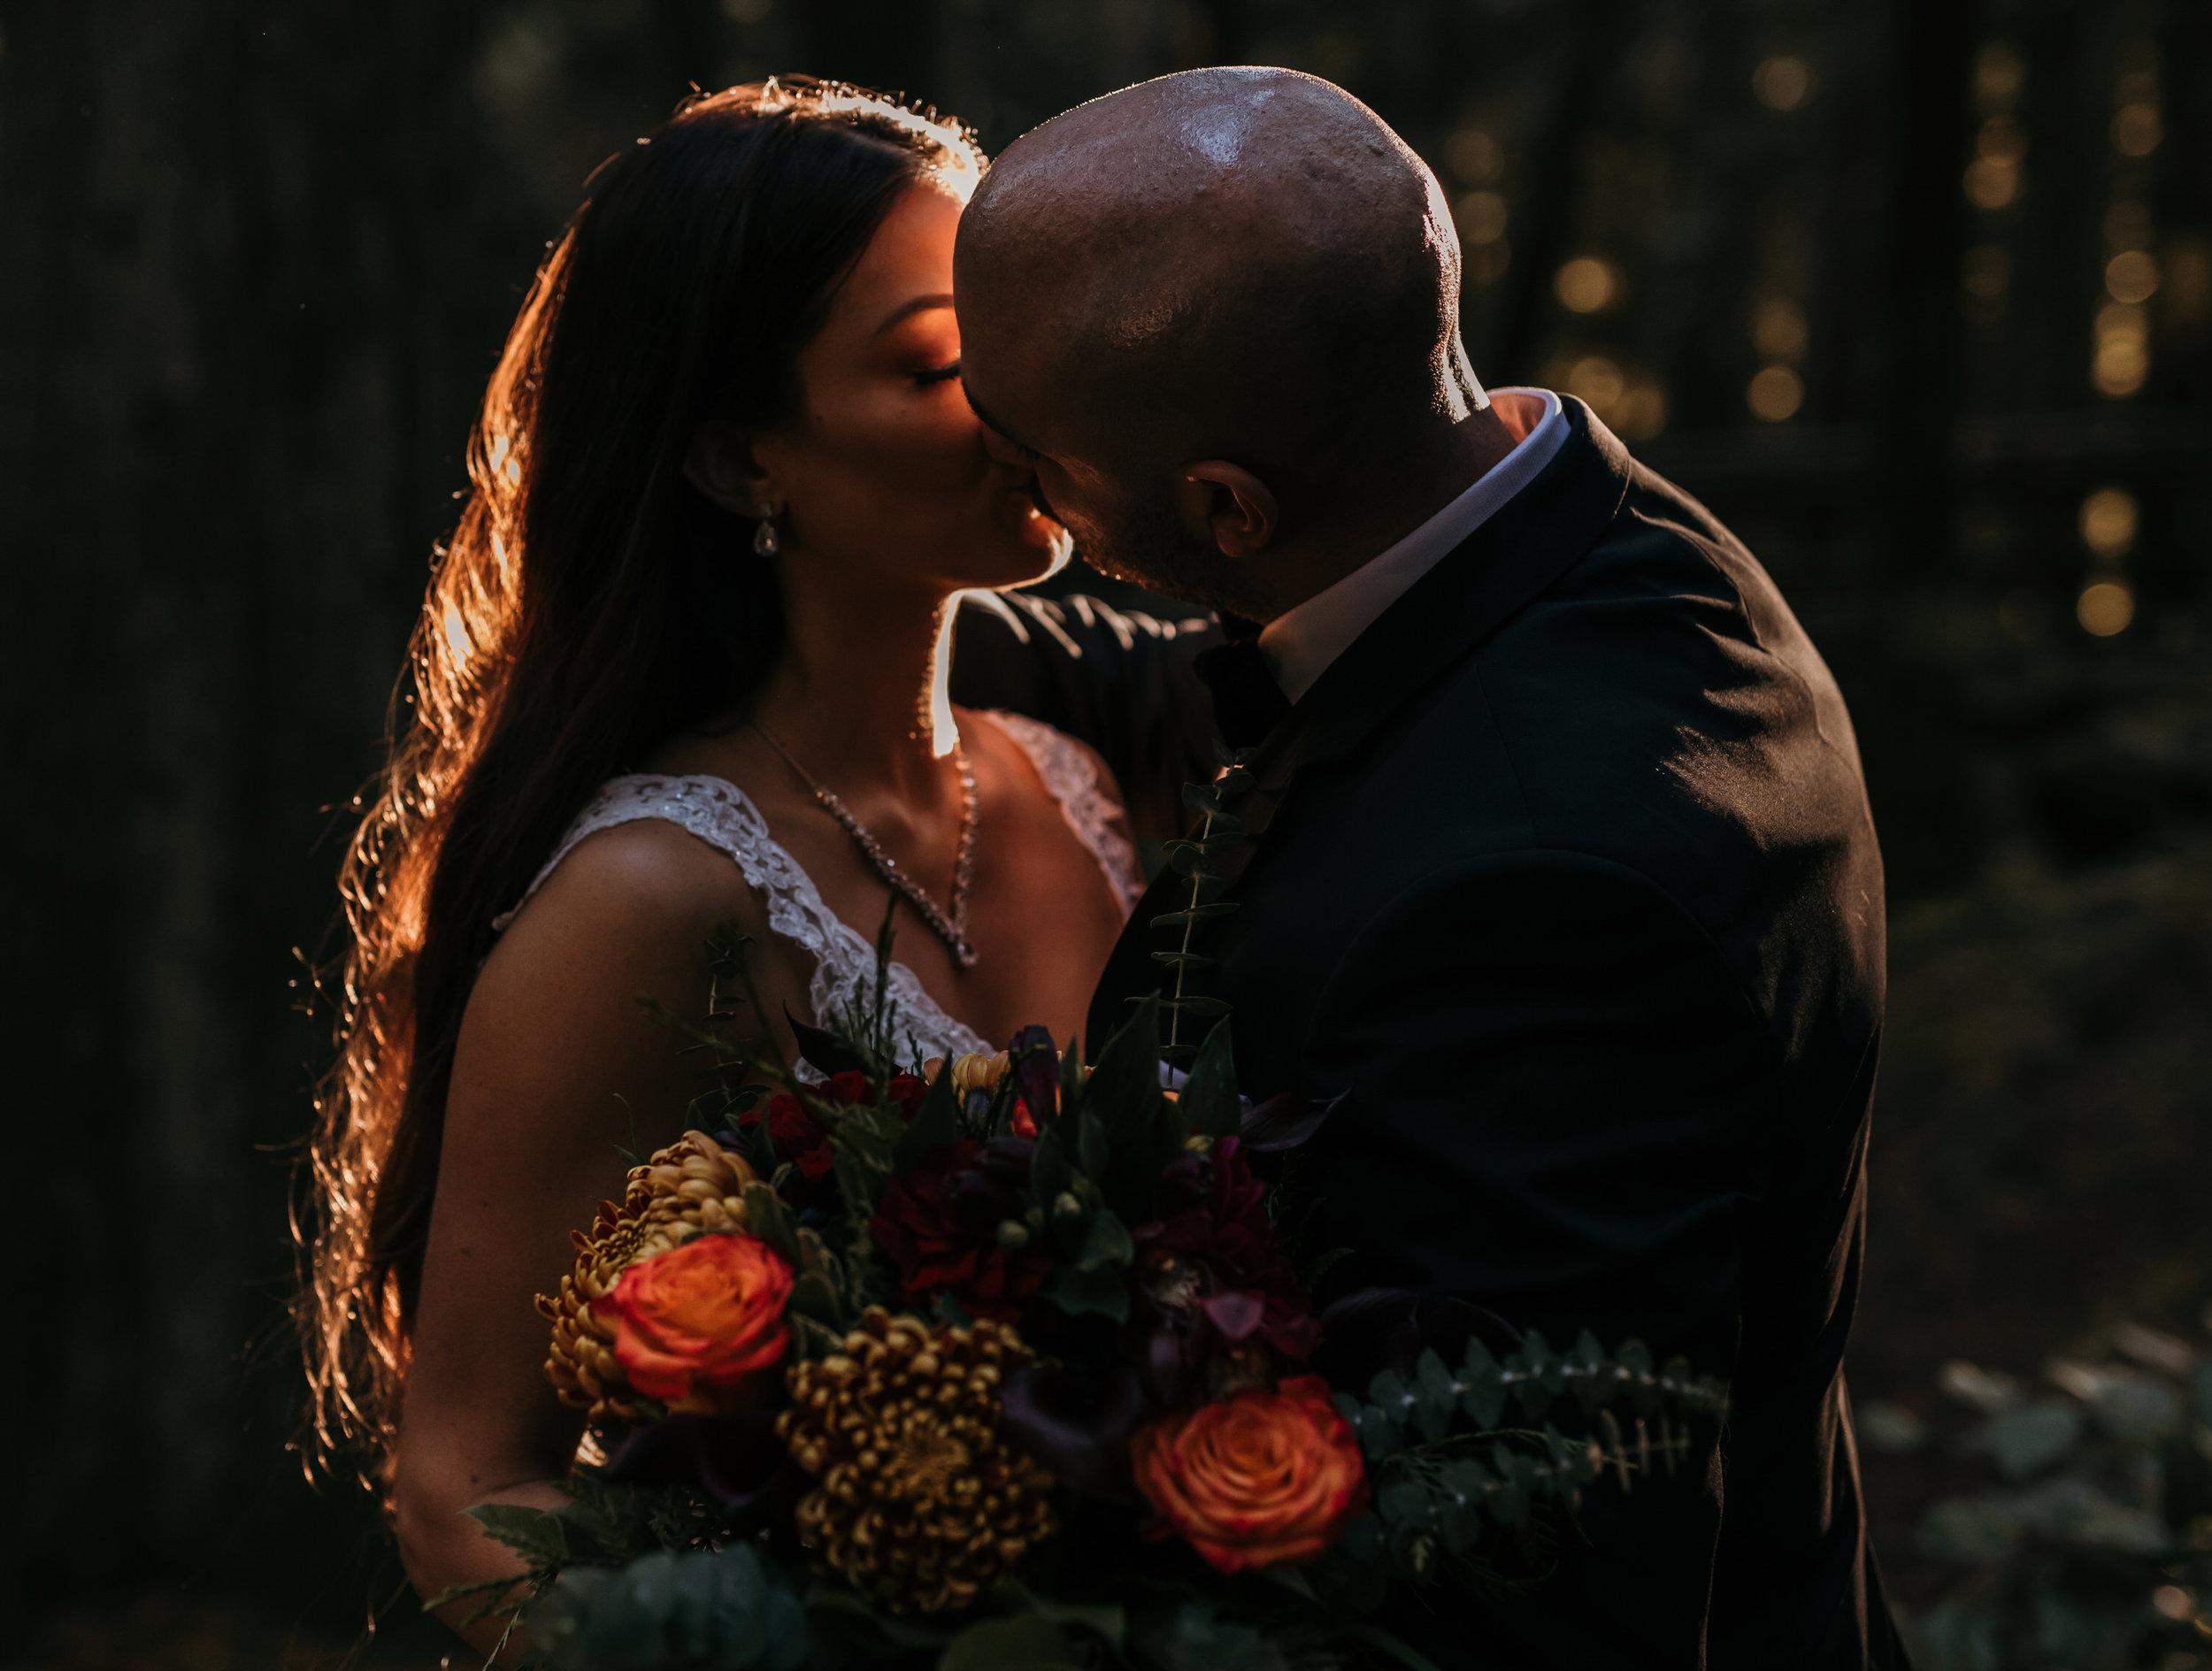 Day After Wedding Photos - Sunshine Coast Wedding Photos - Sunset Wedding Photos - Vancouver Wedding Photographer & Videographer - Sunshine Coast Wedding Photos - Sunshine Coast Wedding Photographer - Jennifer Picard Photography - 1A5A7701.jpg